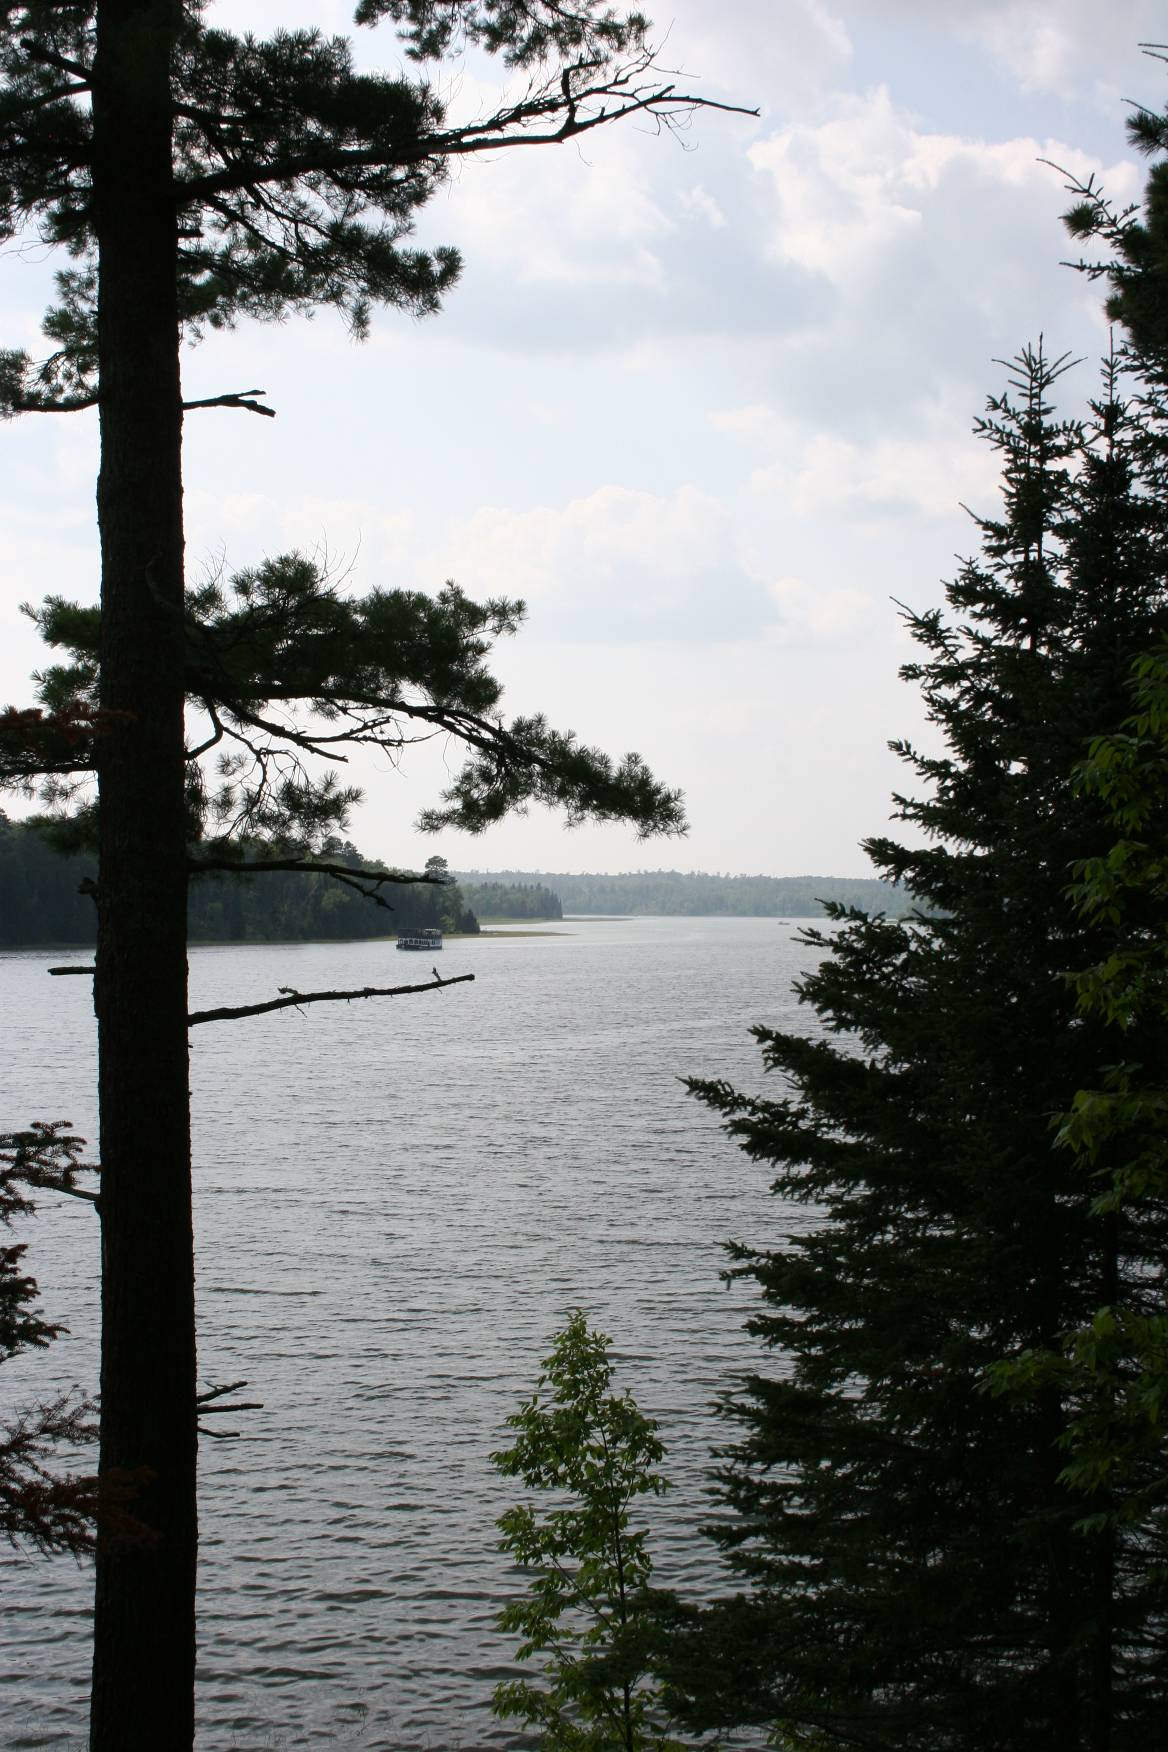 Scenic Peace Pipe Vista, where I heard my second loon.